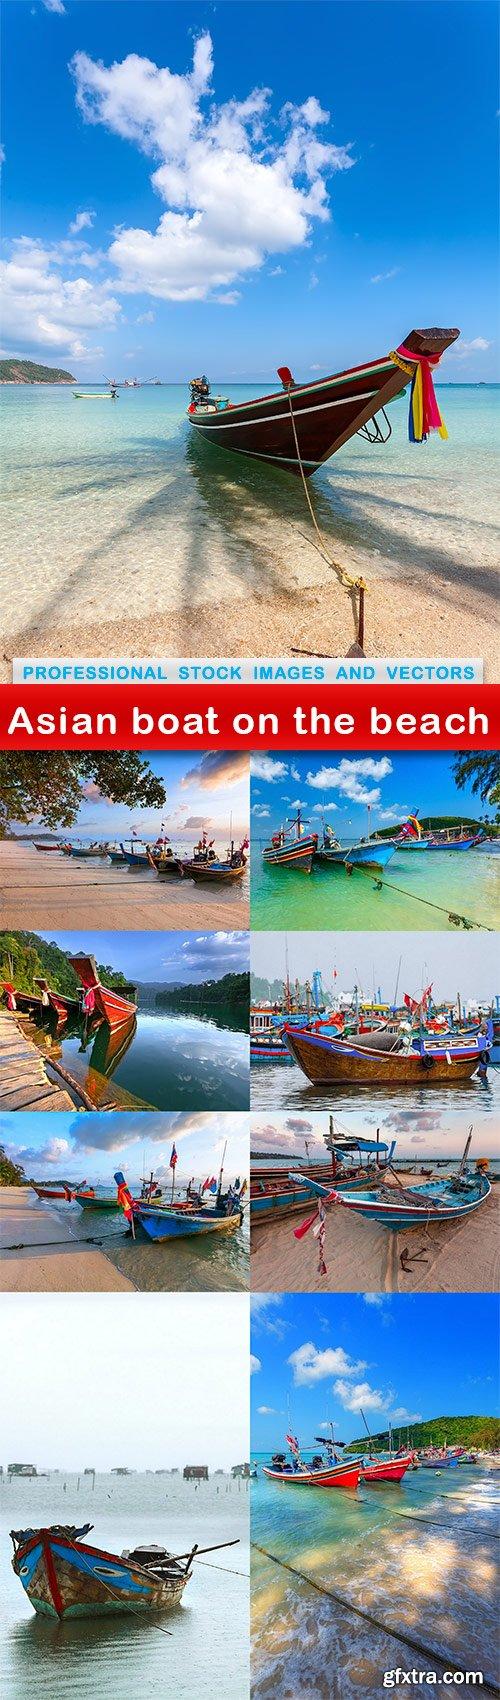 Asian boat on the beach - 9 UHQ JPEG